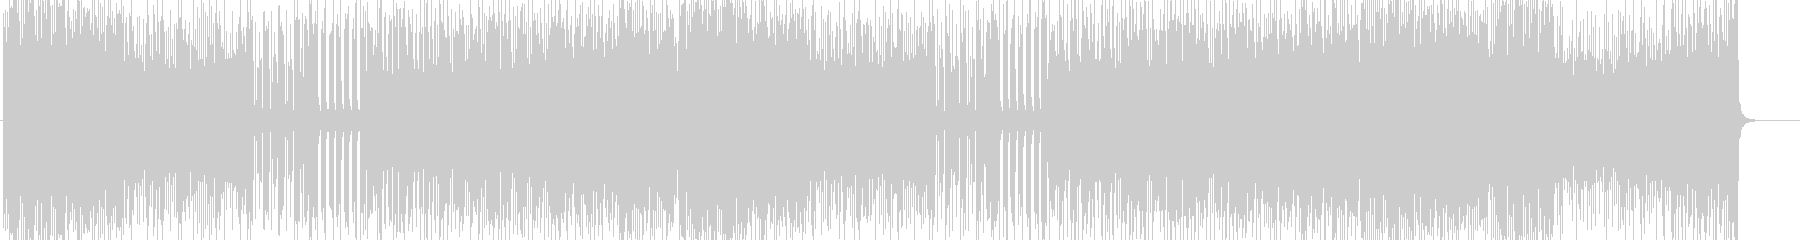 「HR/HM」「ROCK」BGM213の未再生の波形